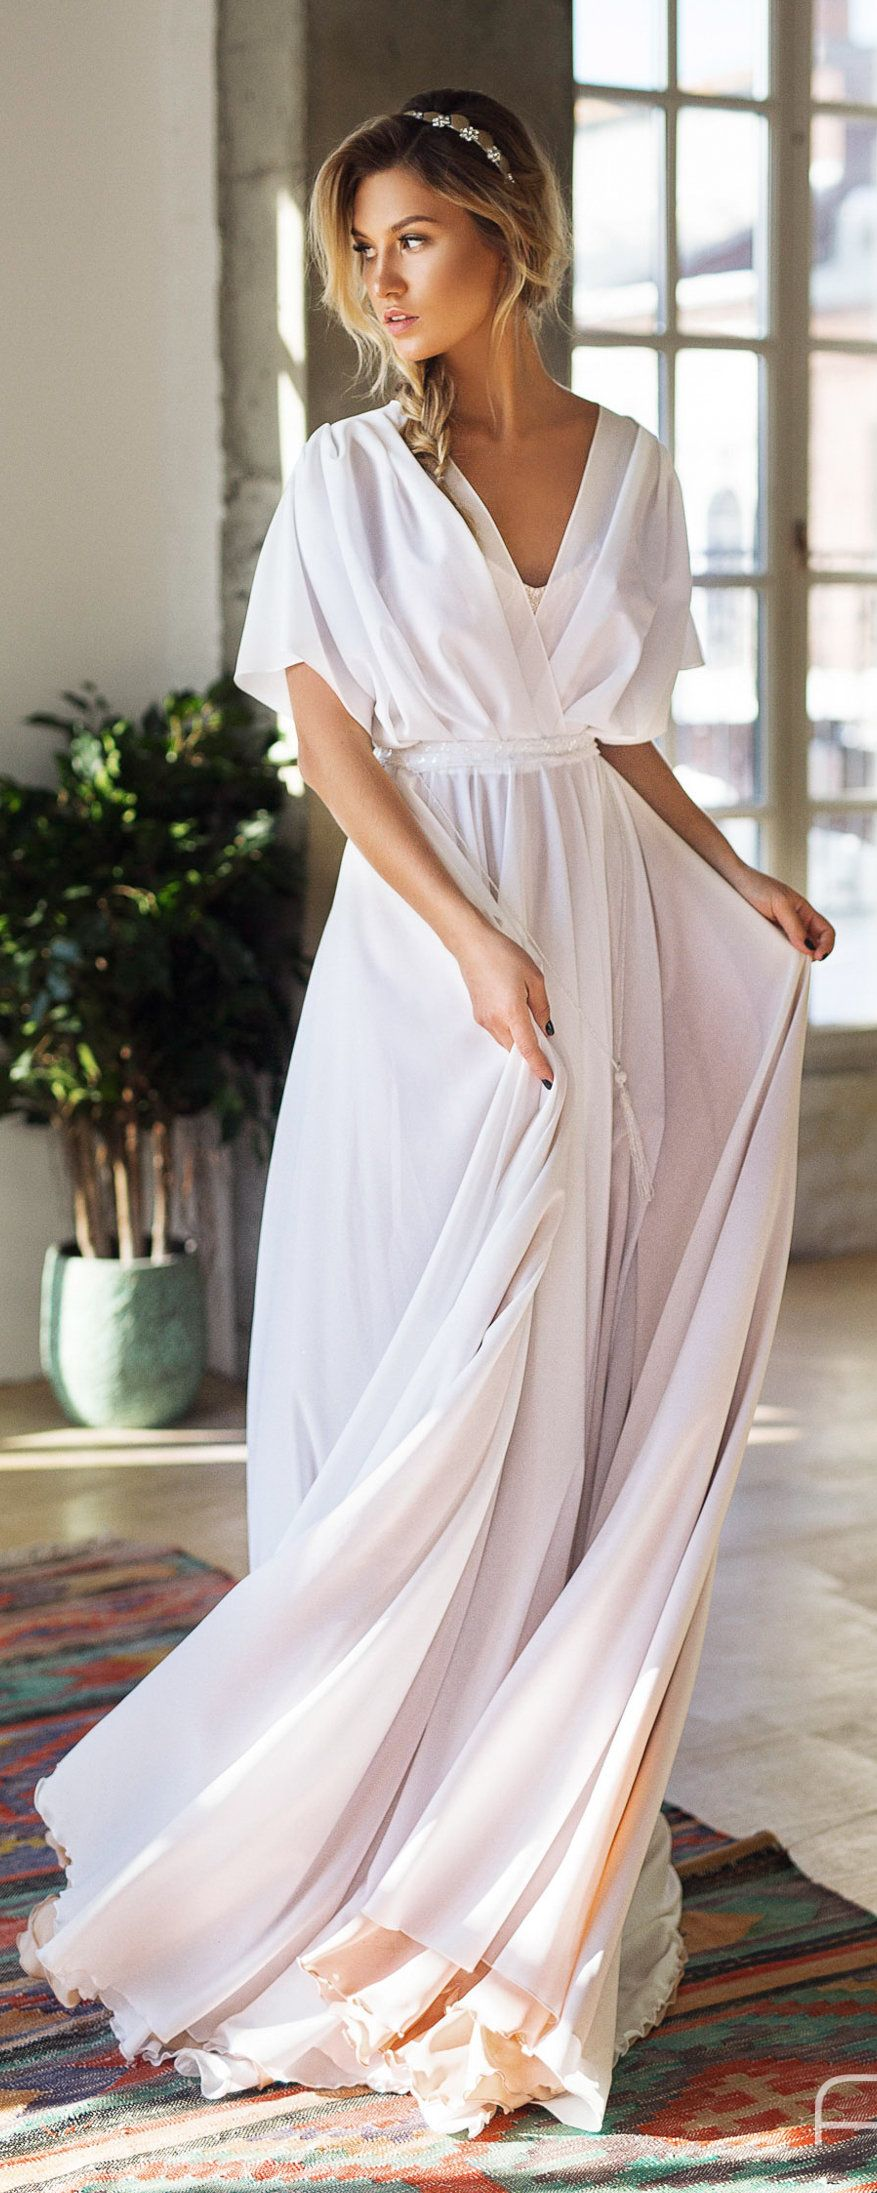 Wedding dress udesireu in art of fashion pinterest